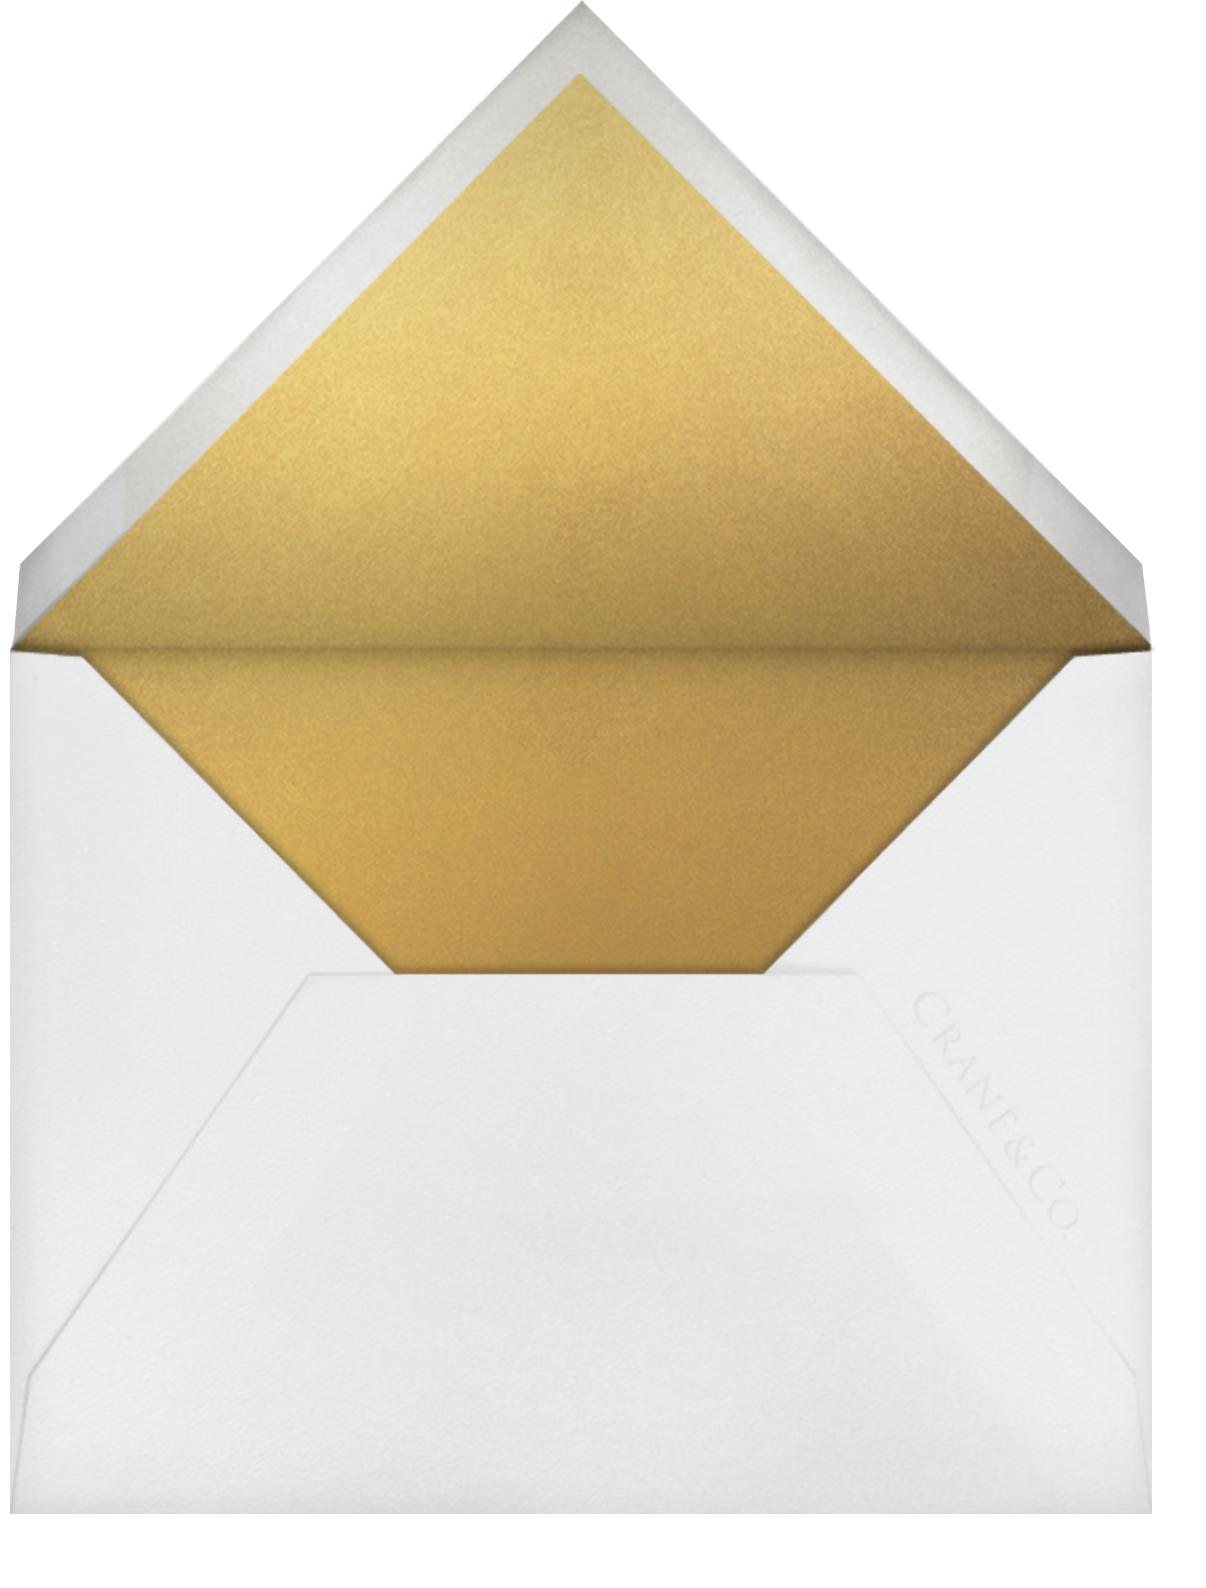 Winter Garden I (Card) - Gold - Paperless Post - Use your own logo - envelope back